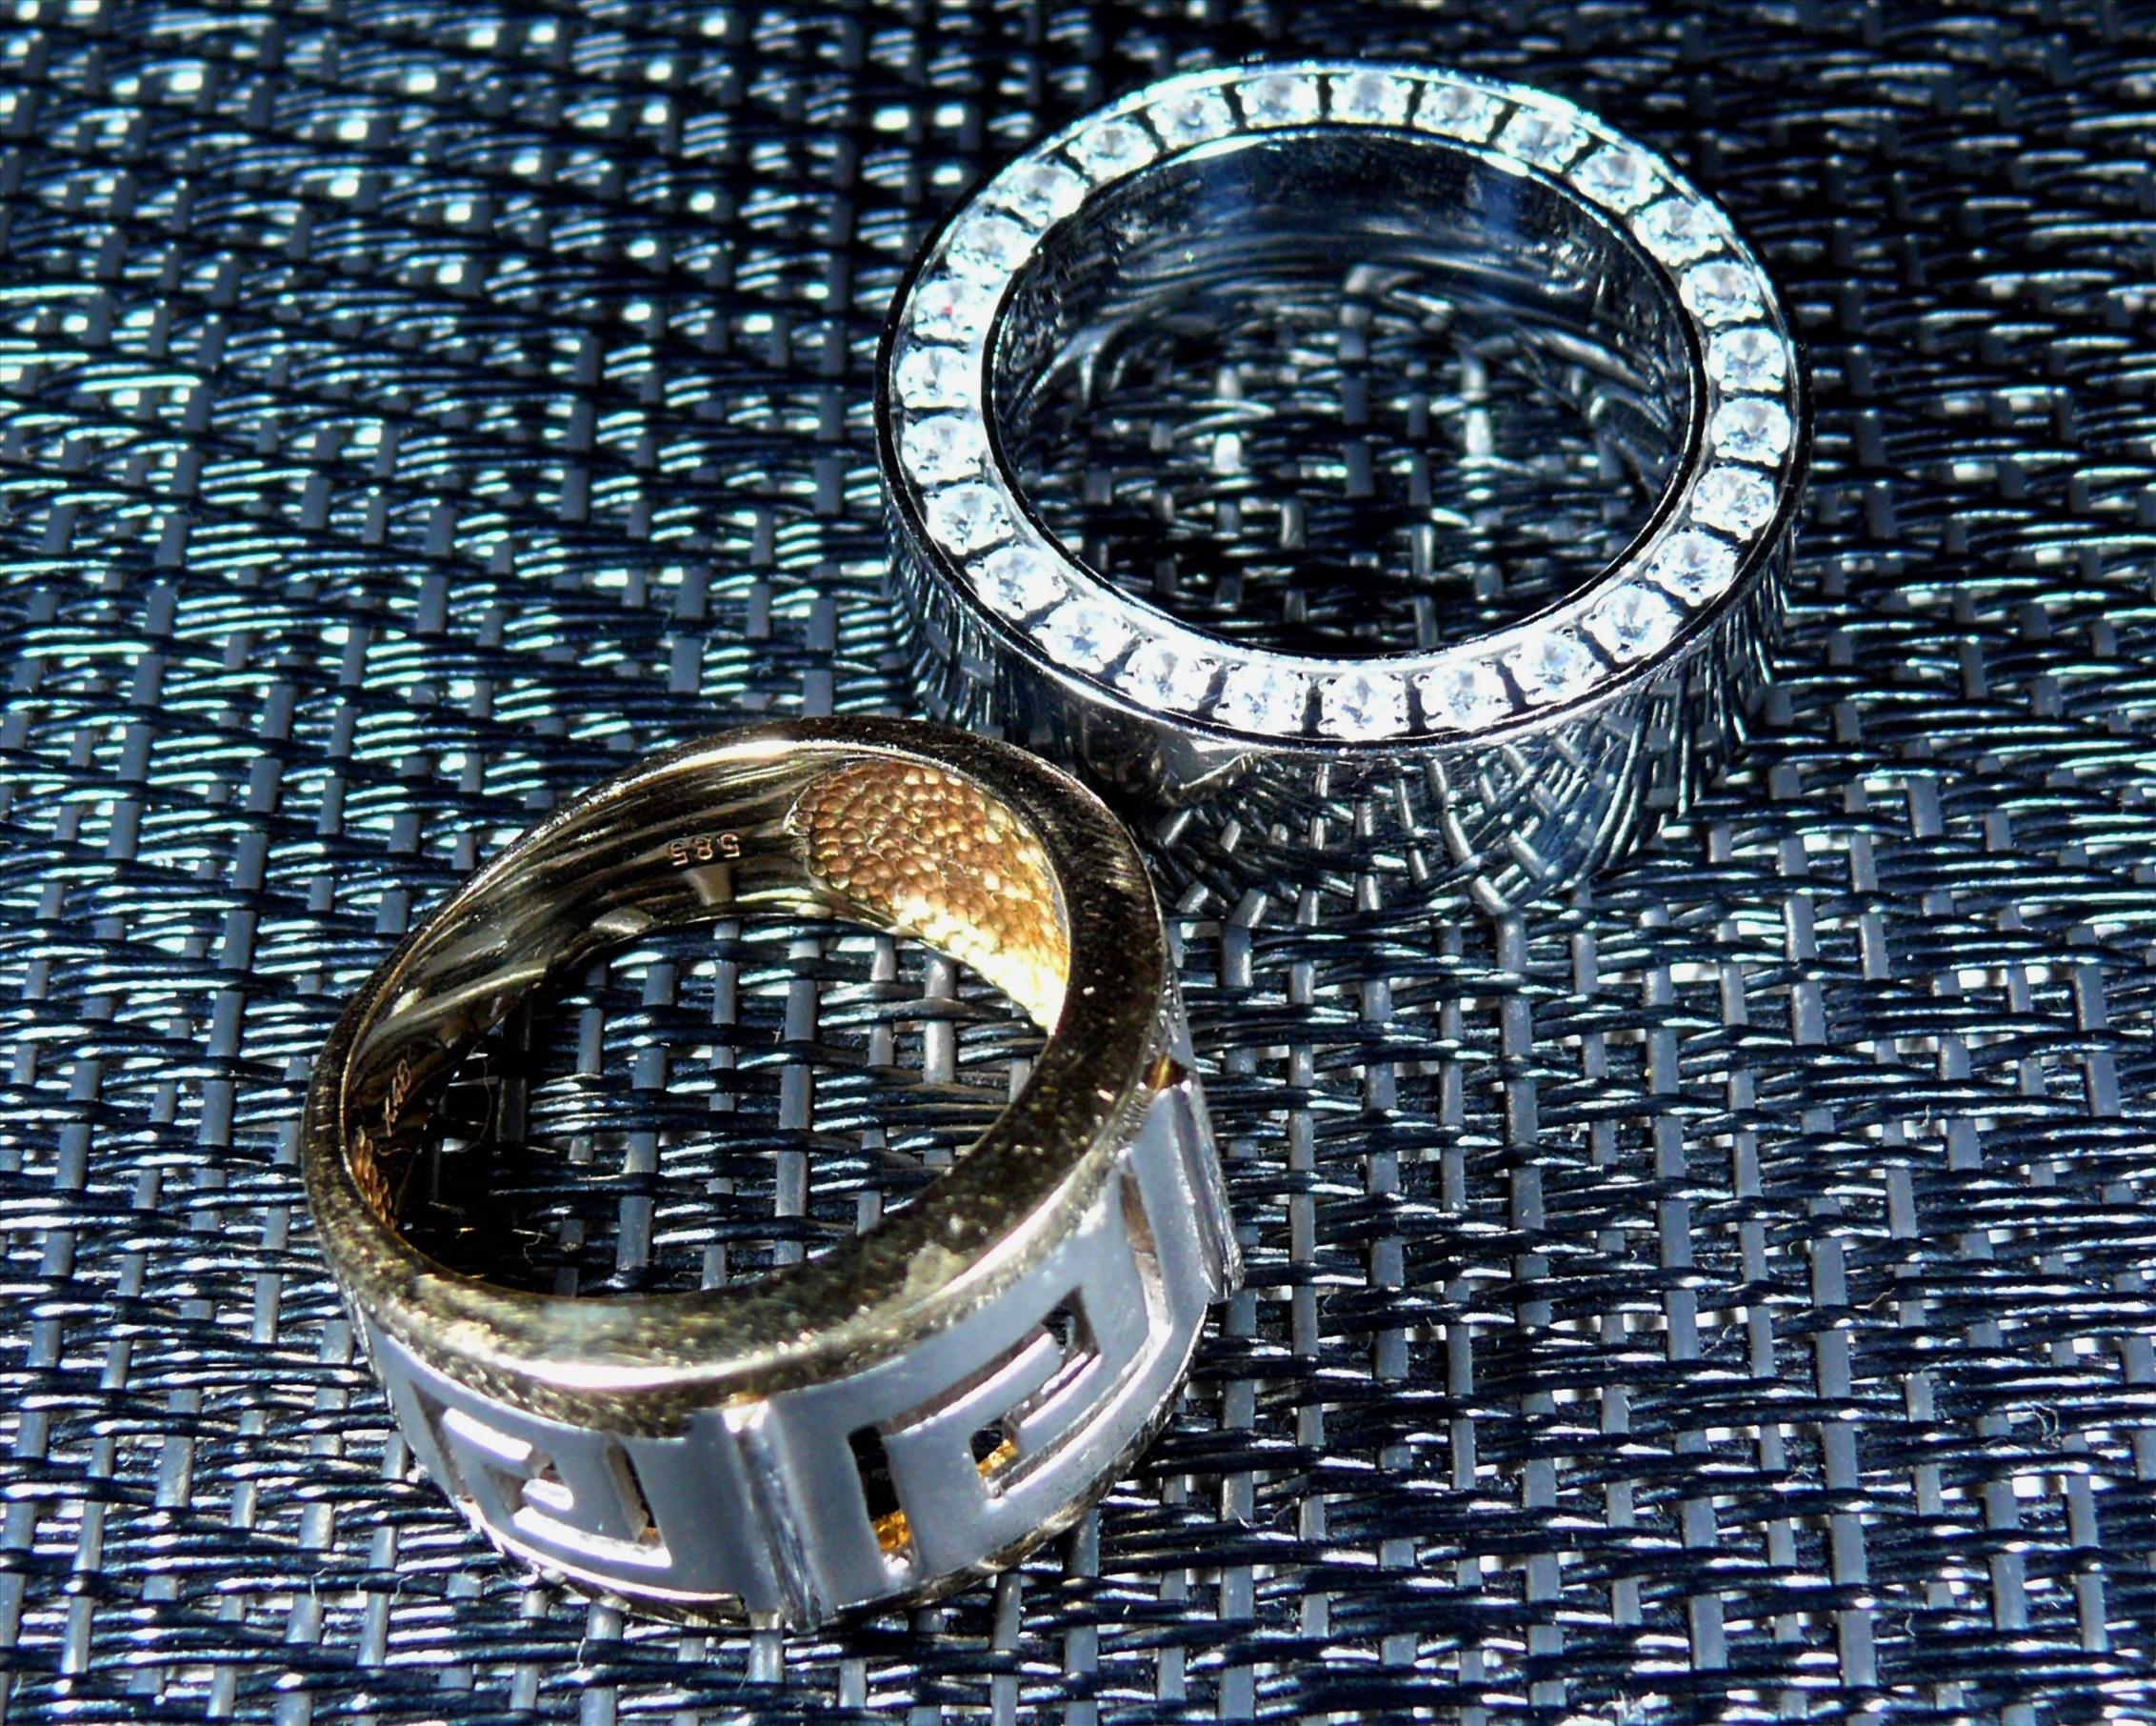 Free Images watch love bride groom marriage jewellery hands